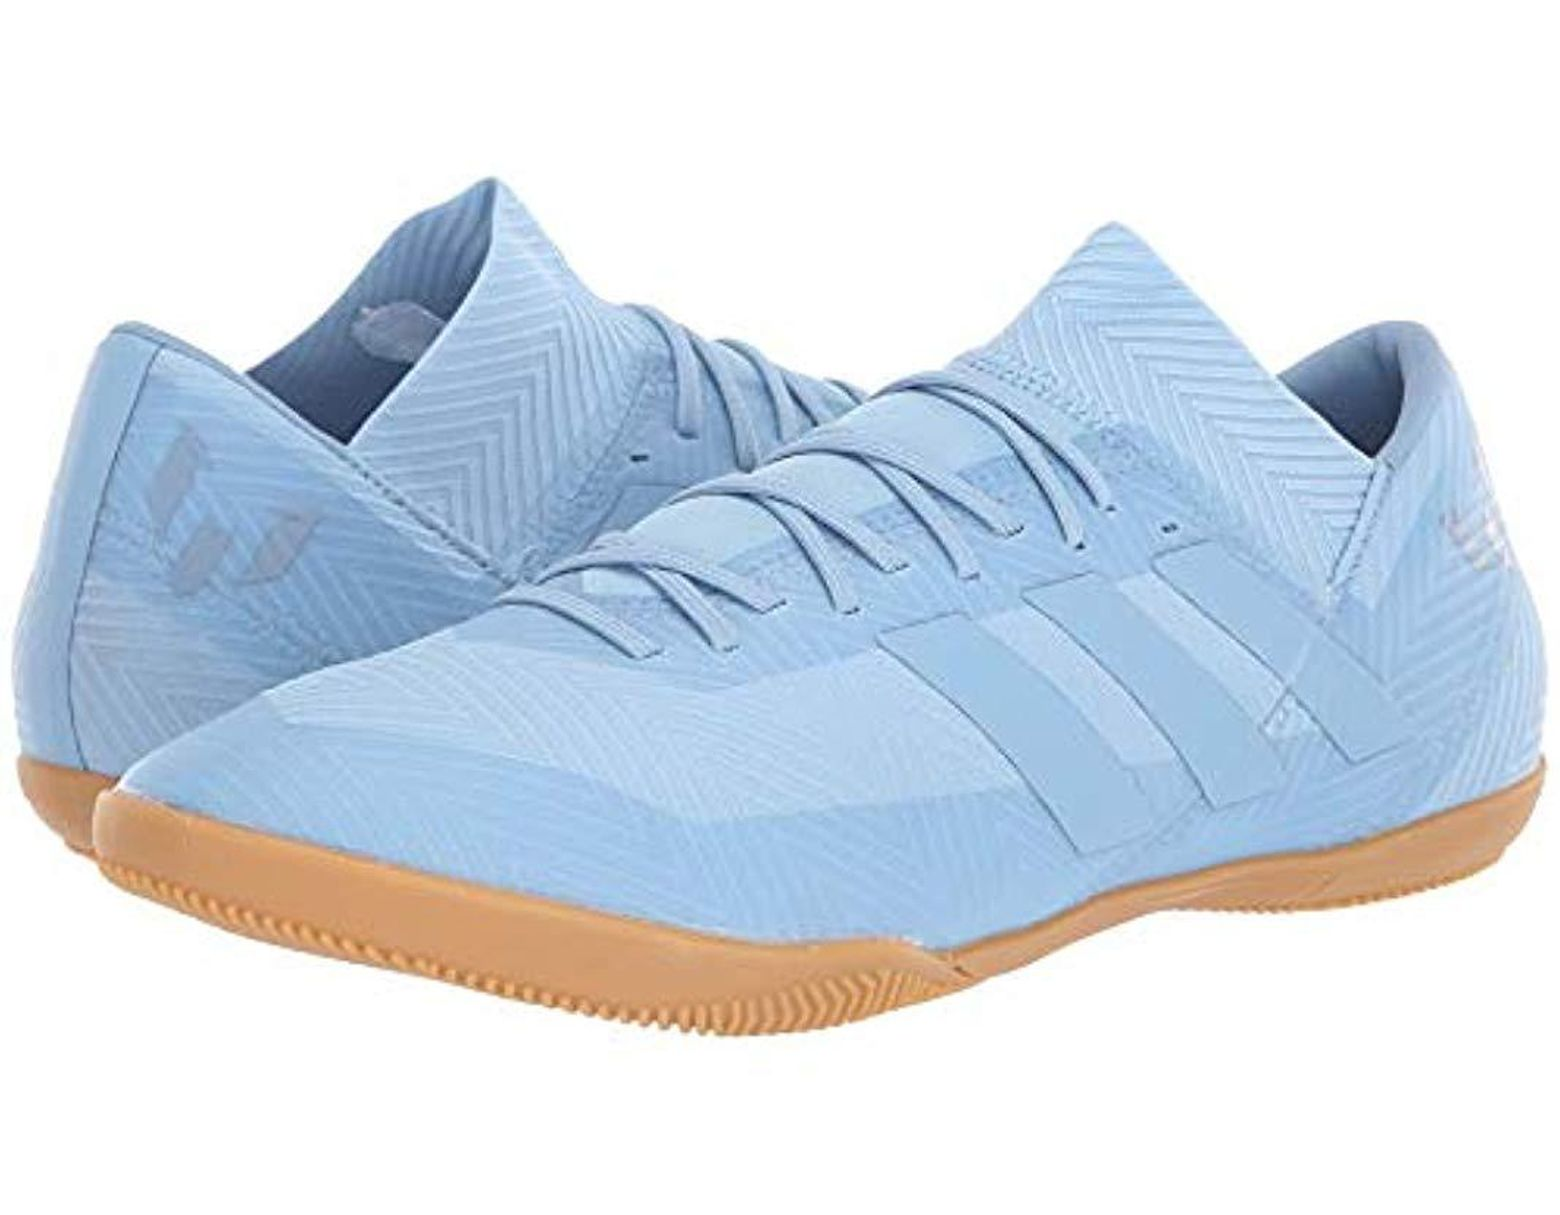 f8e17aae4c3d8 Men's Blue Nemeziz Messi Tango 18.3 Indoor Soccer Shoe